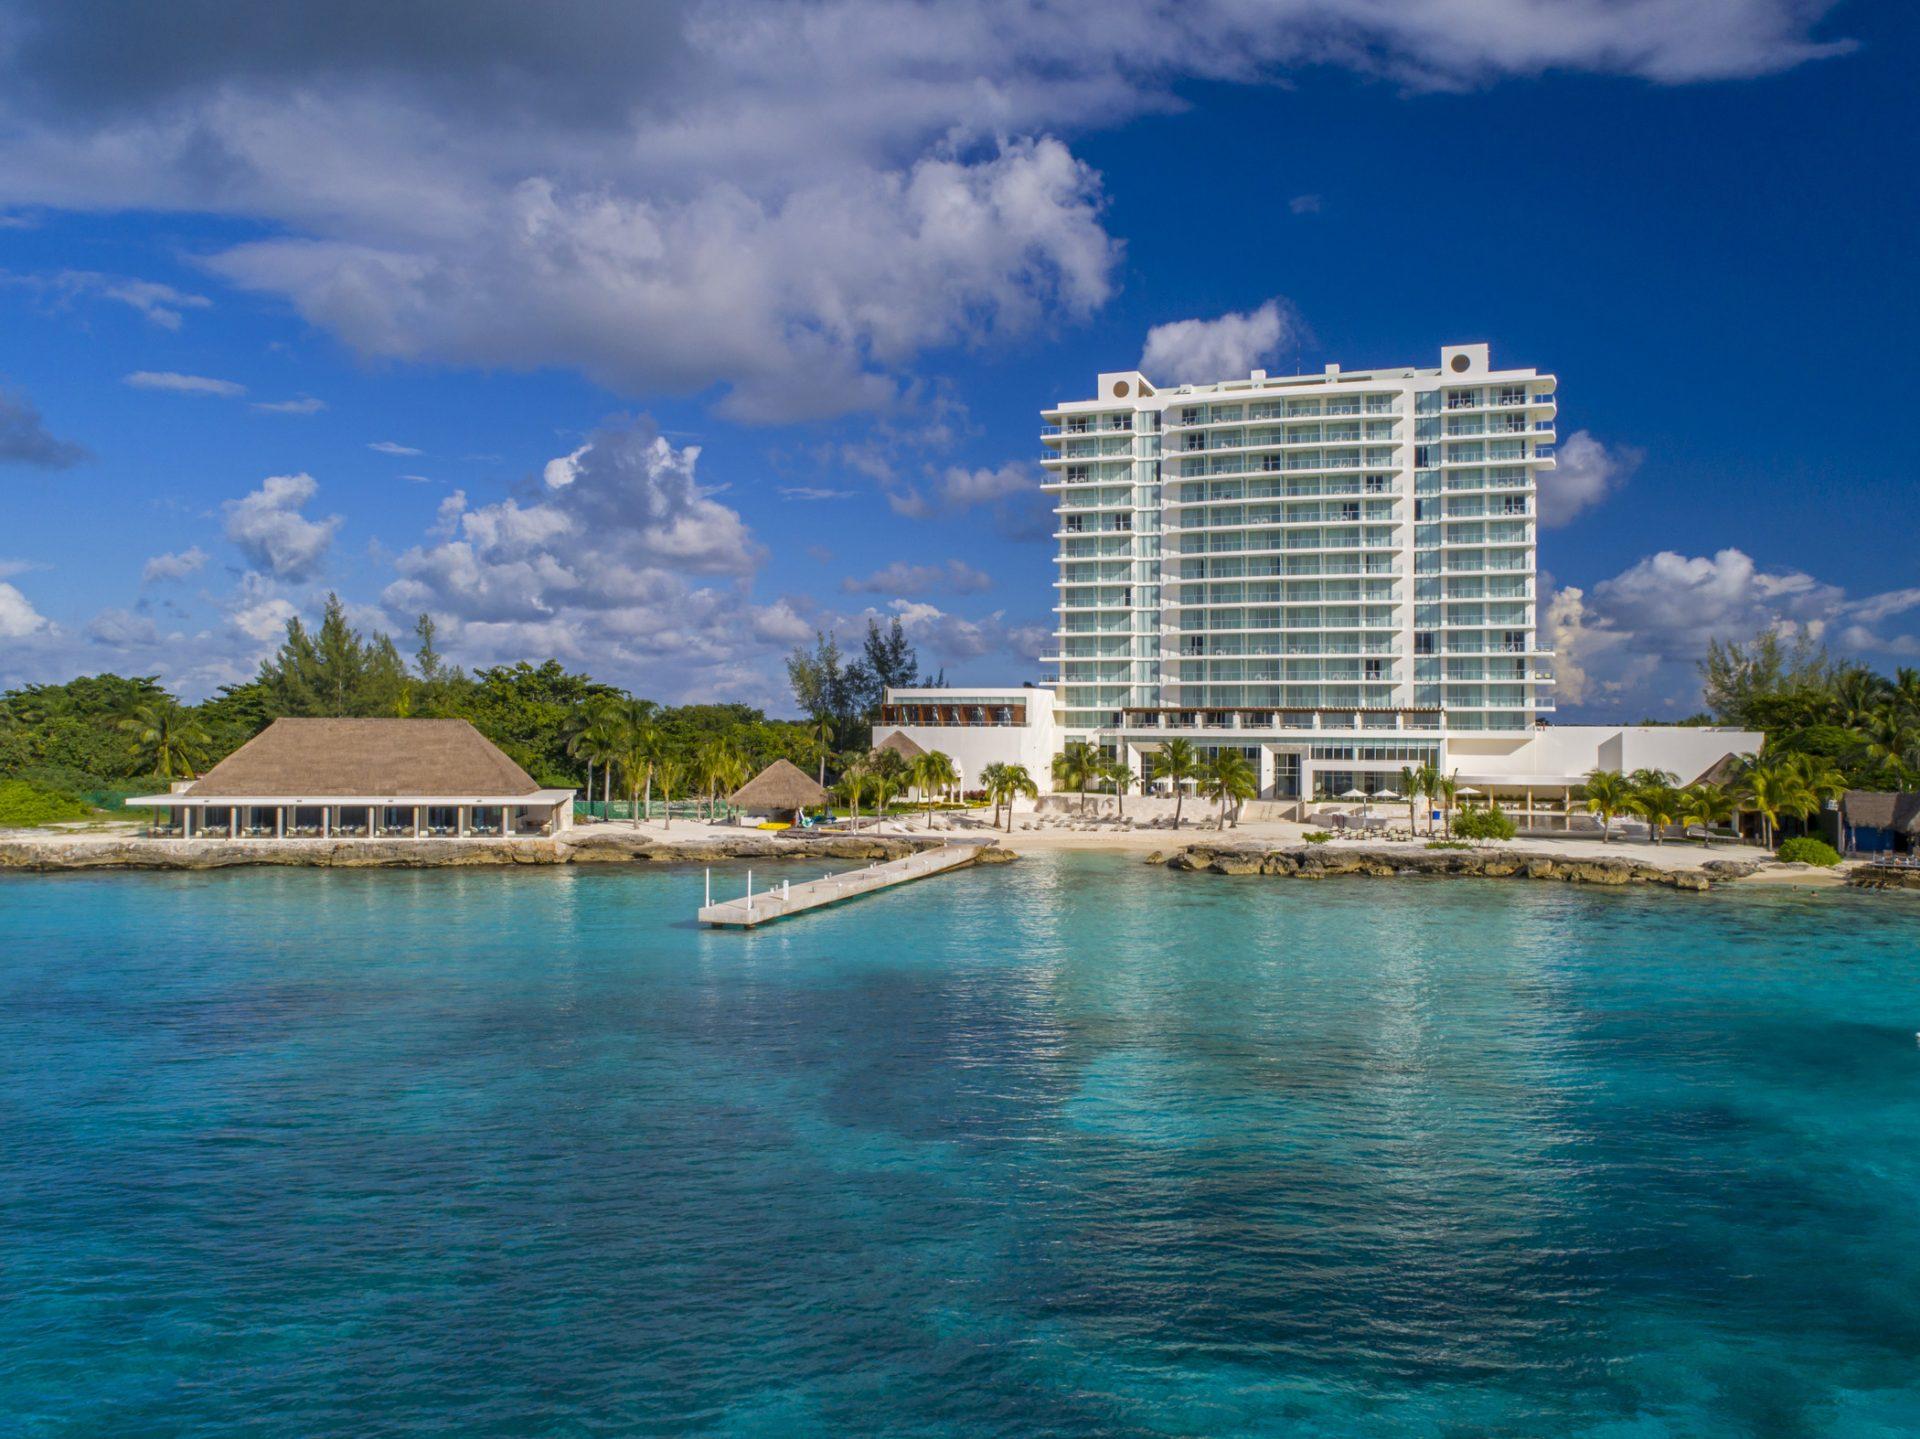 The Westin Cozumel, lujo y relax en el Caribe